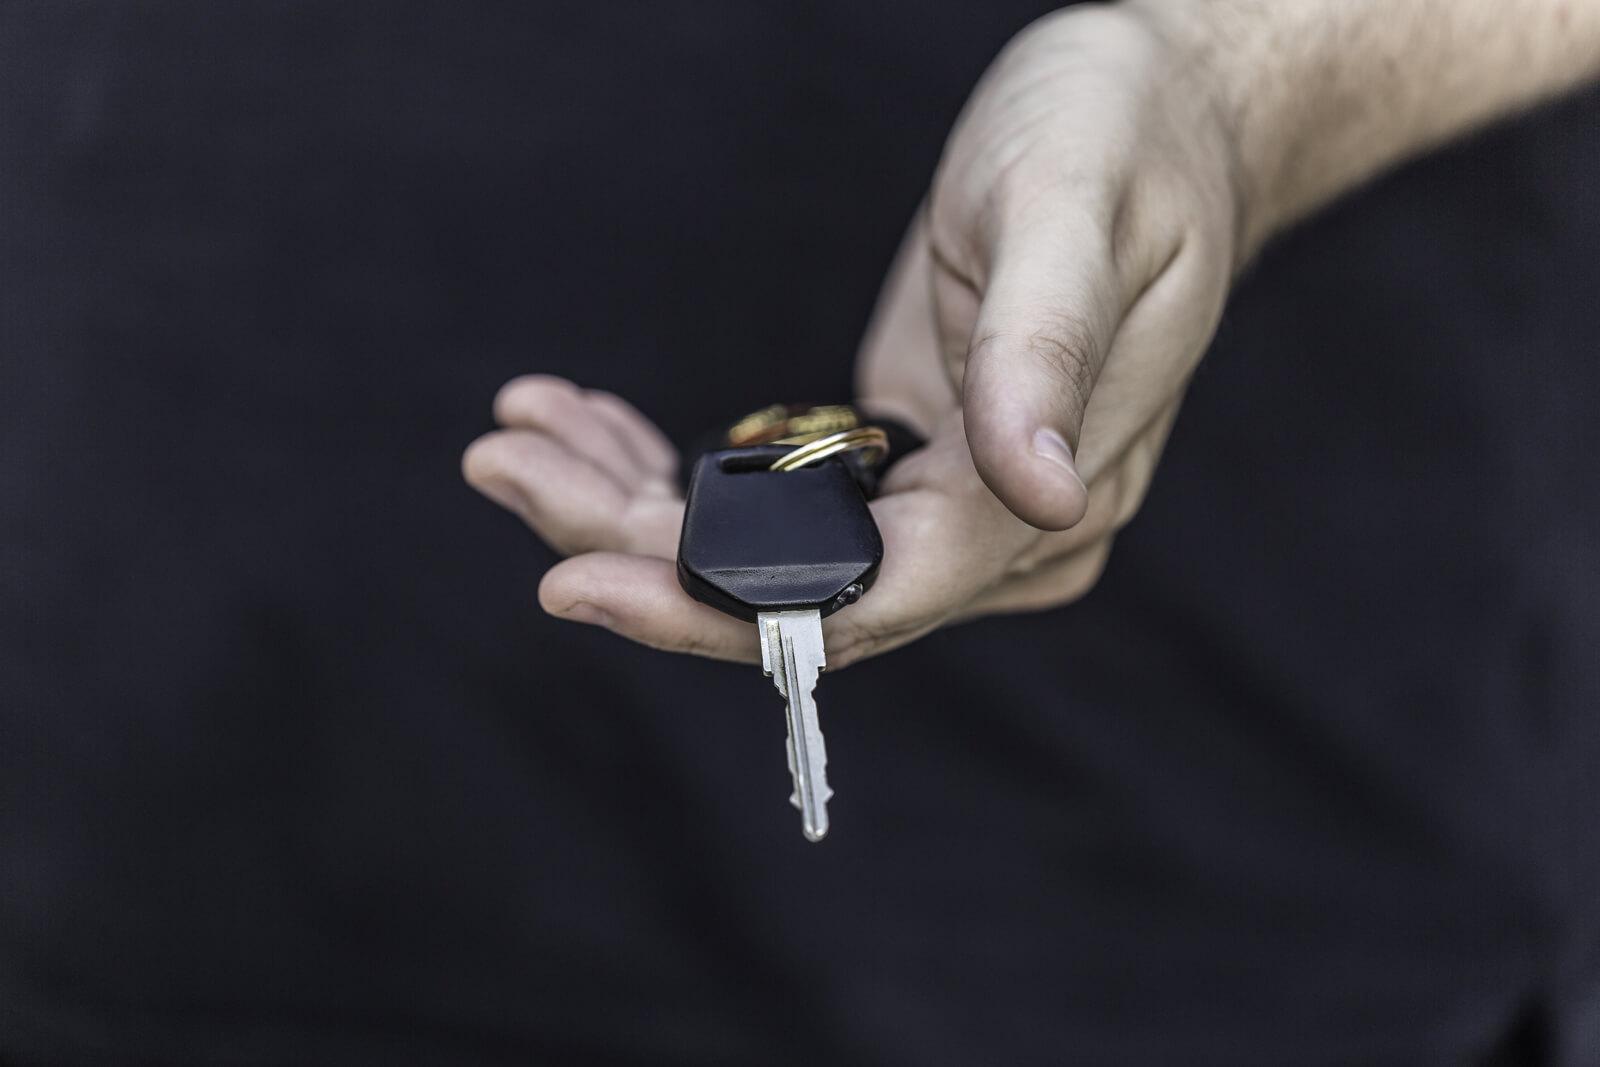 Avoiding Future Auto Insurance Problems